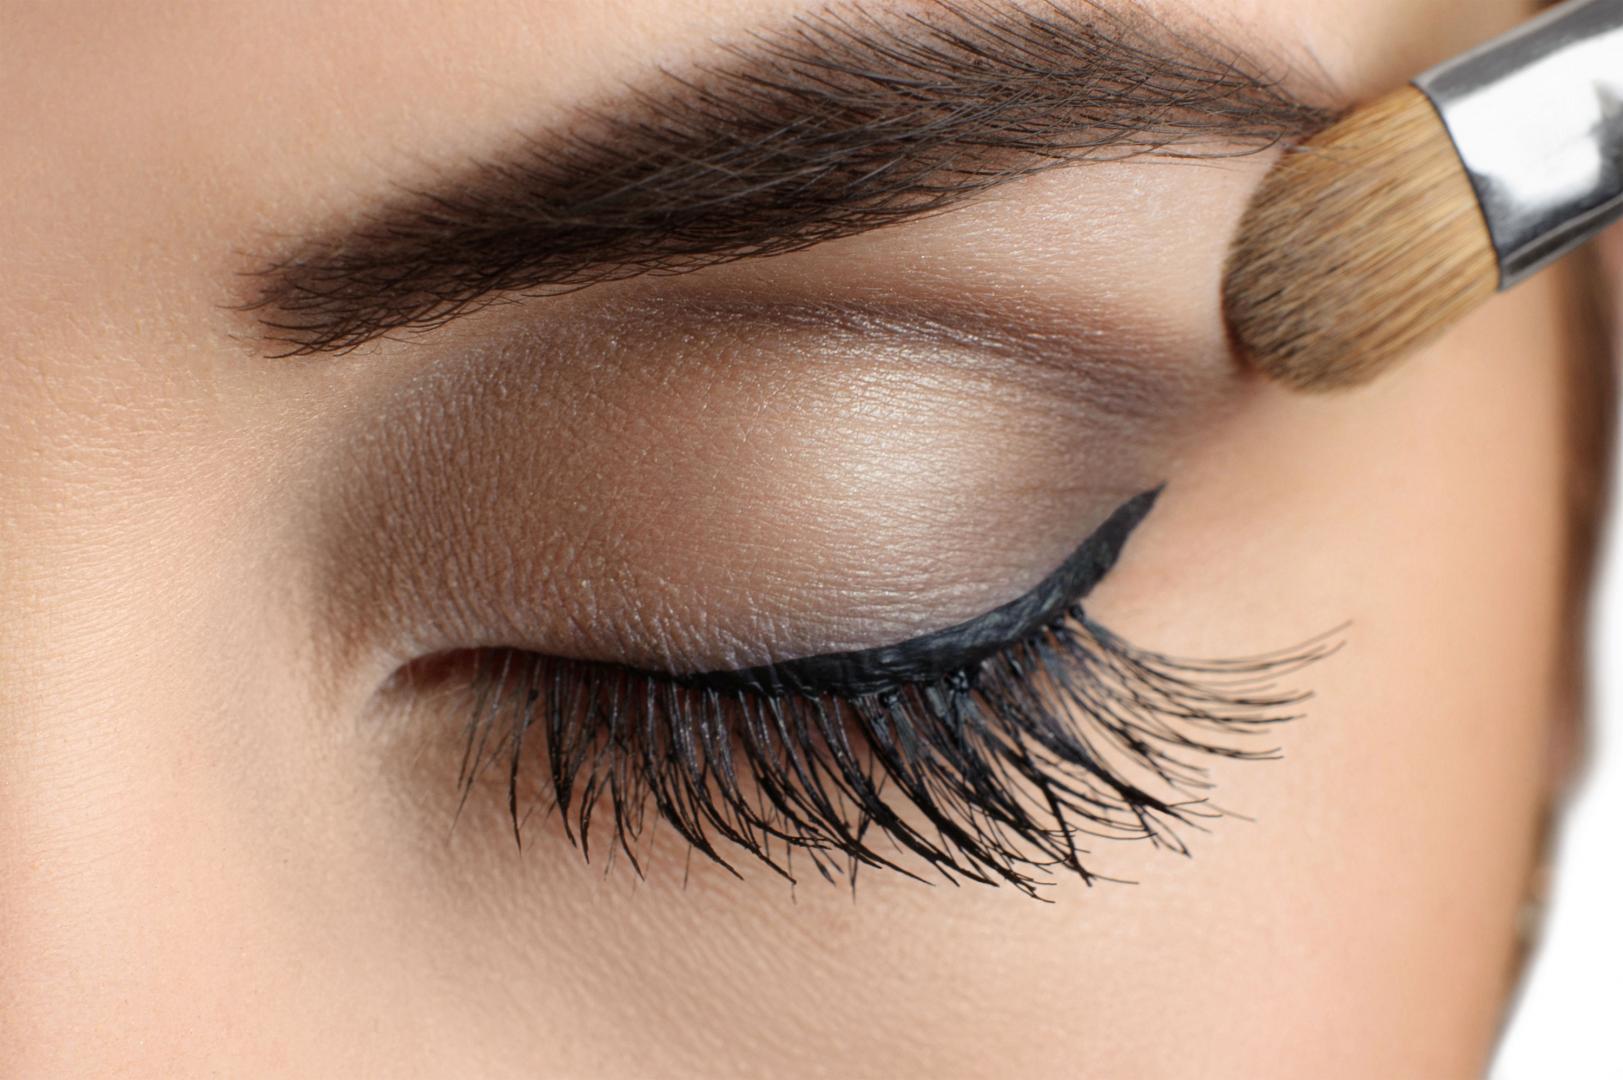 Makeup artist services Miami